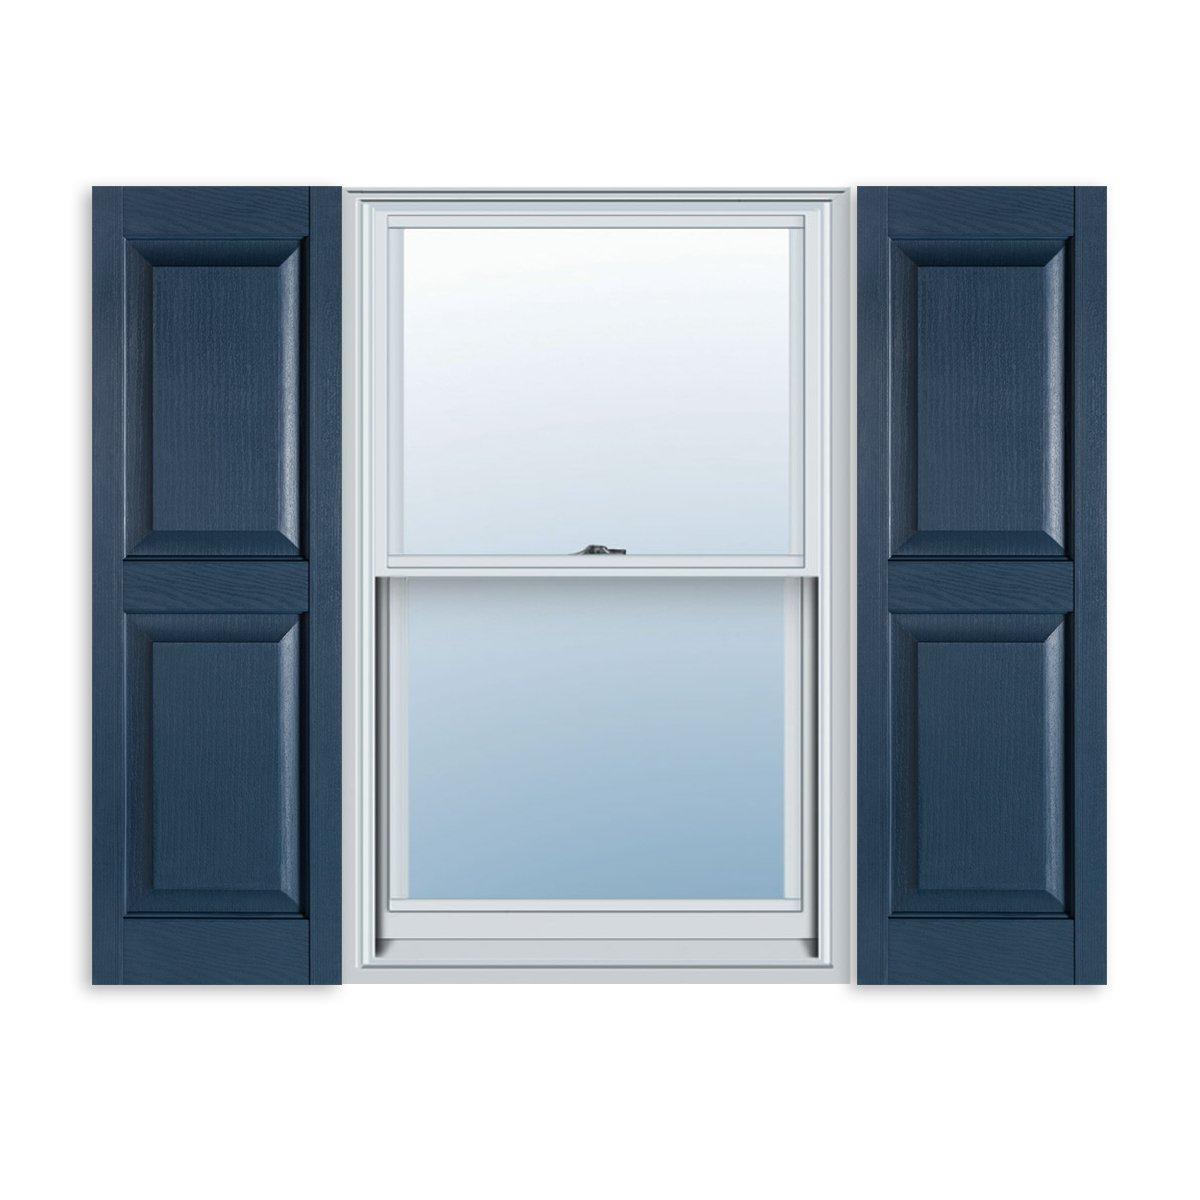 Amazon.com: 15 Inch X 63 Inch Standard Raised Panel Exterior Vinyl Shutter,  Bedford Blue (Pair): Home U0026 Kitchen